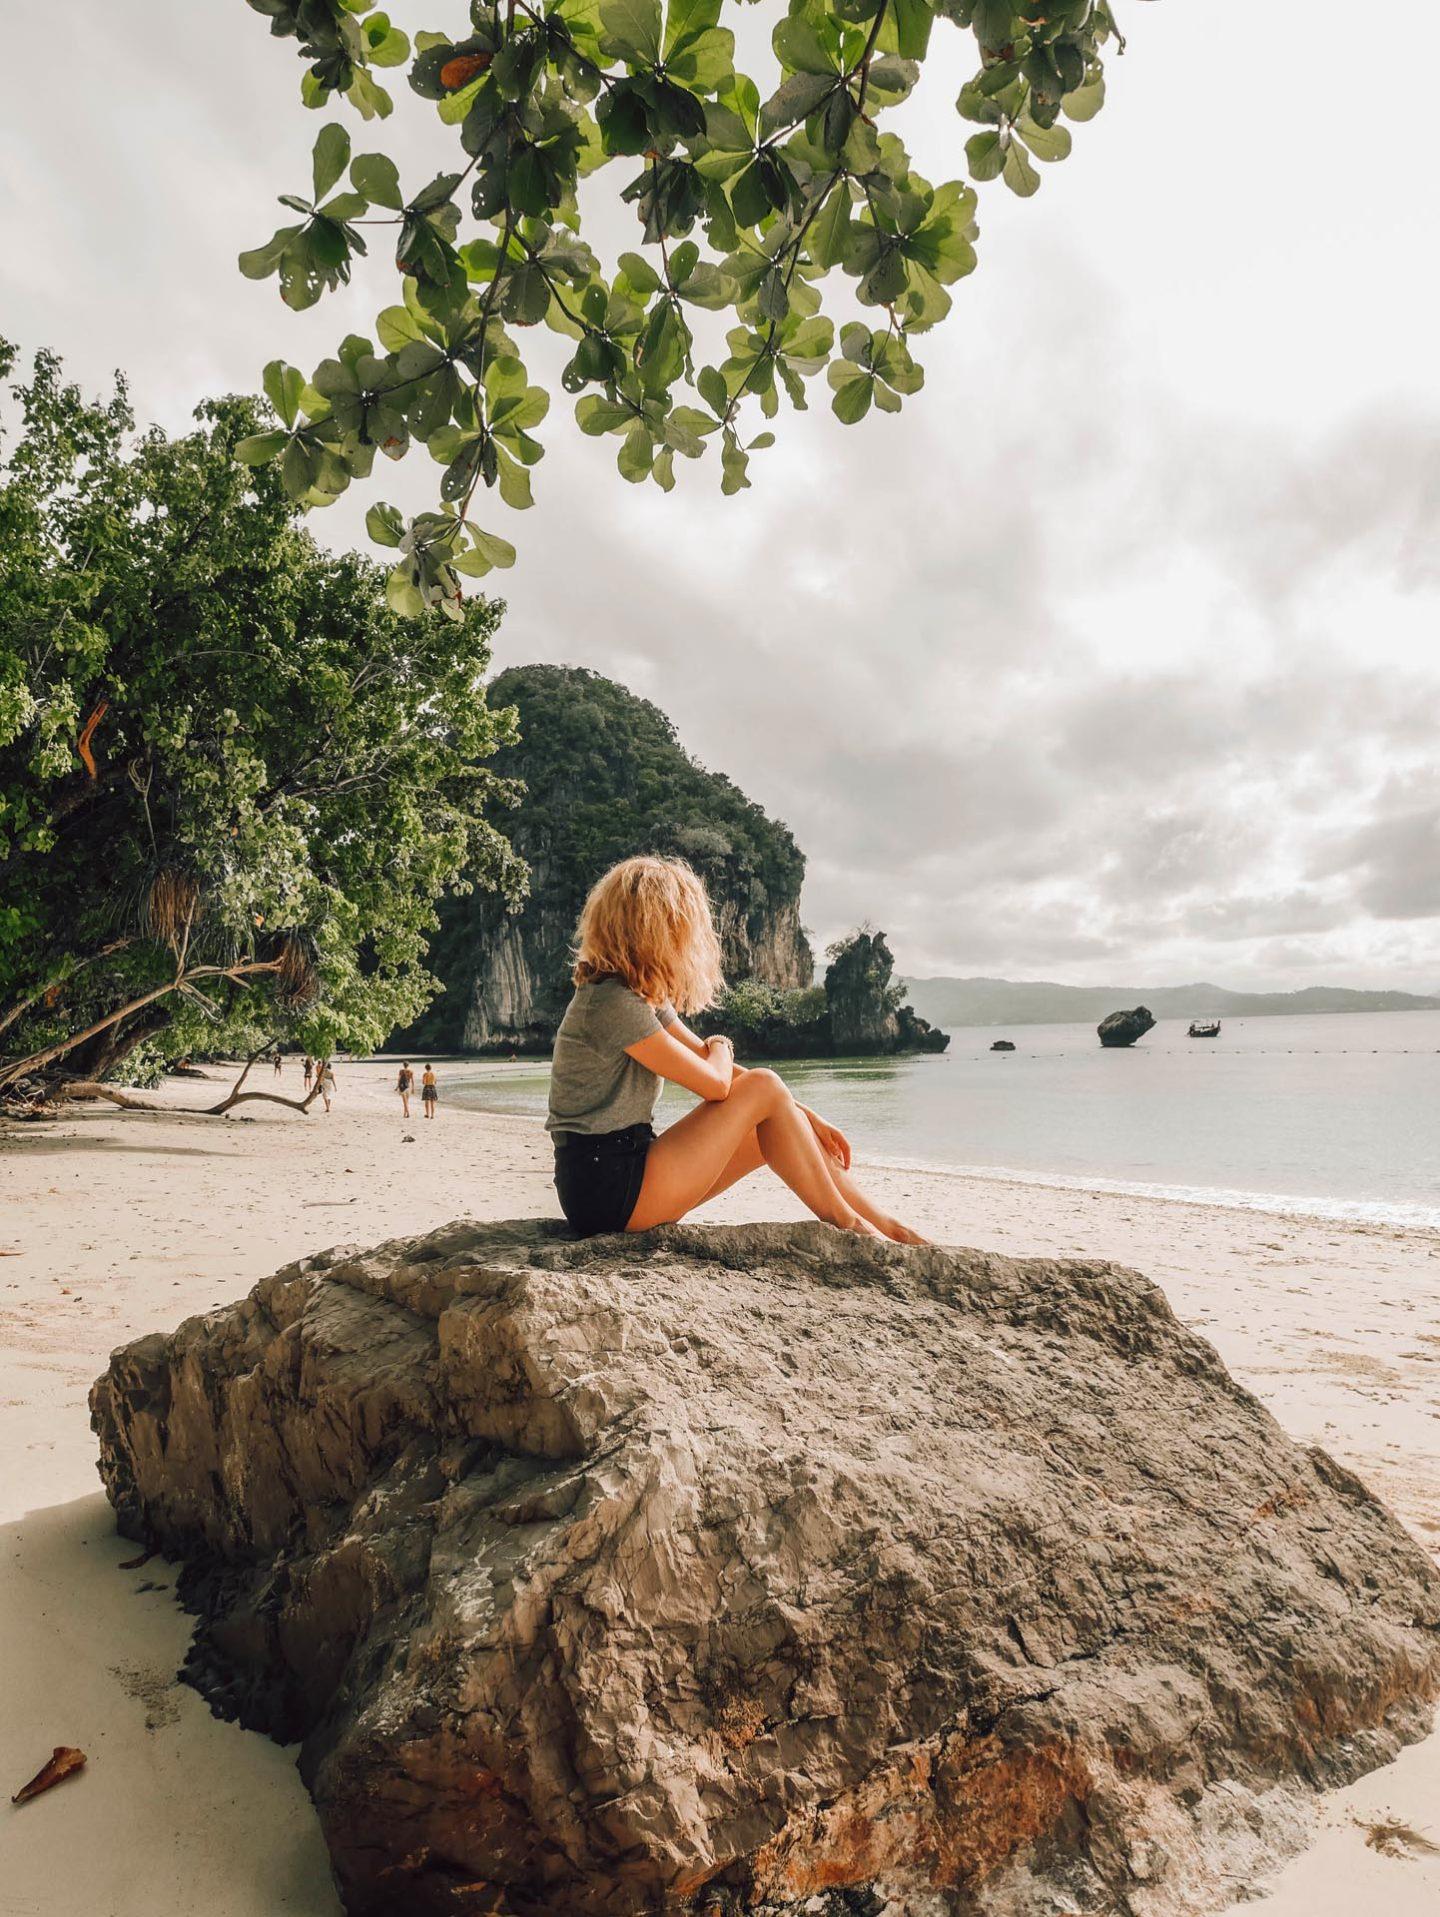 thailand tourism krabi beach time landscape madebyf belgian blogger blogueuse belge voyage travel